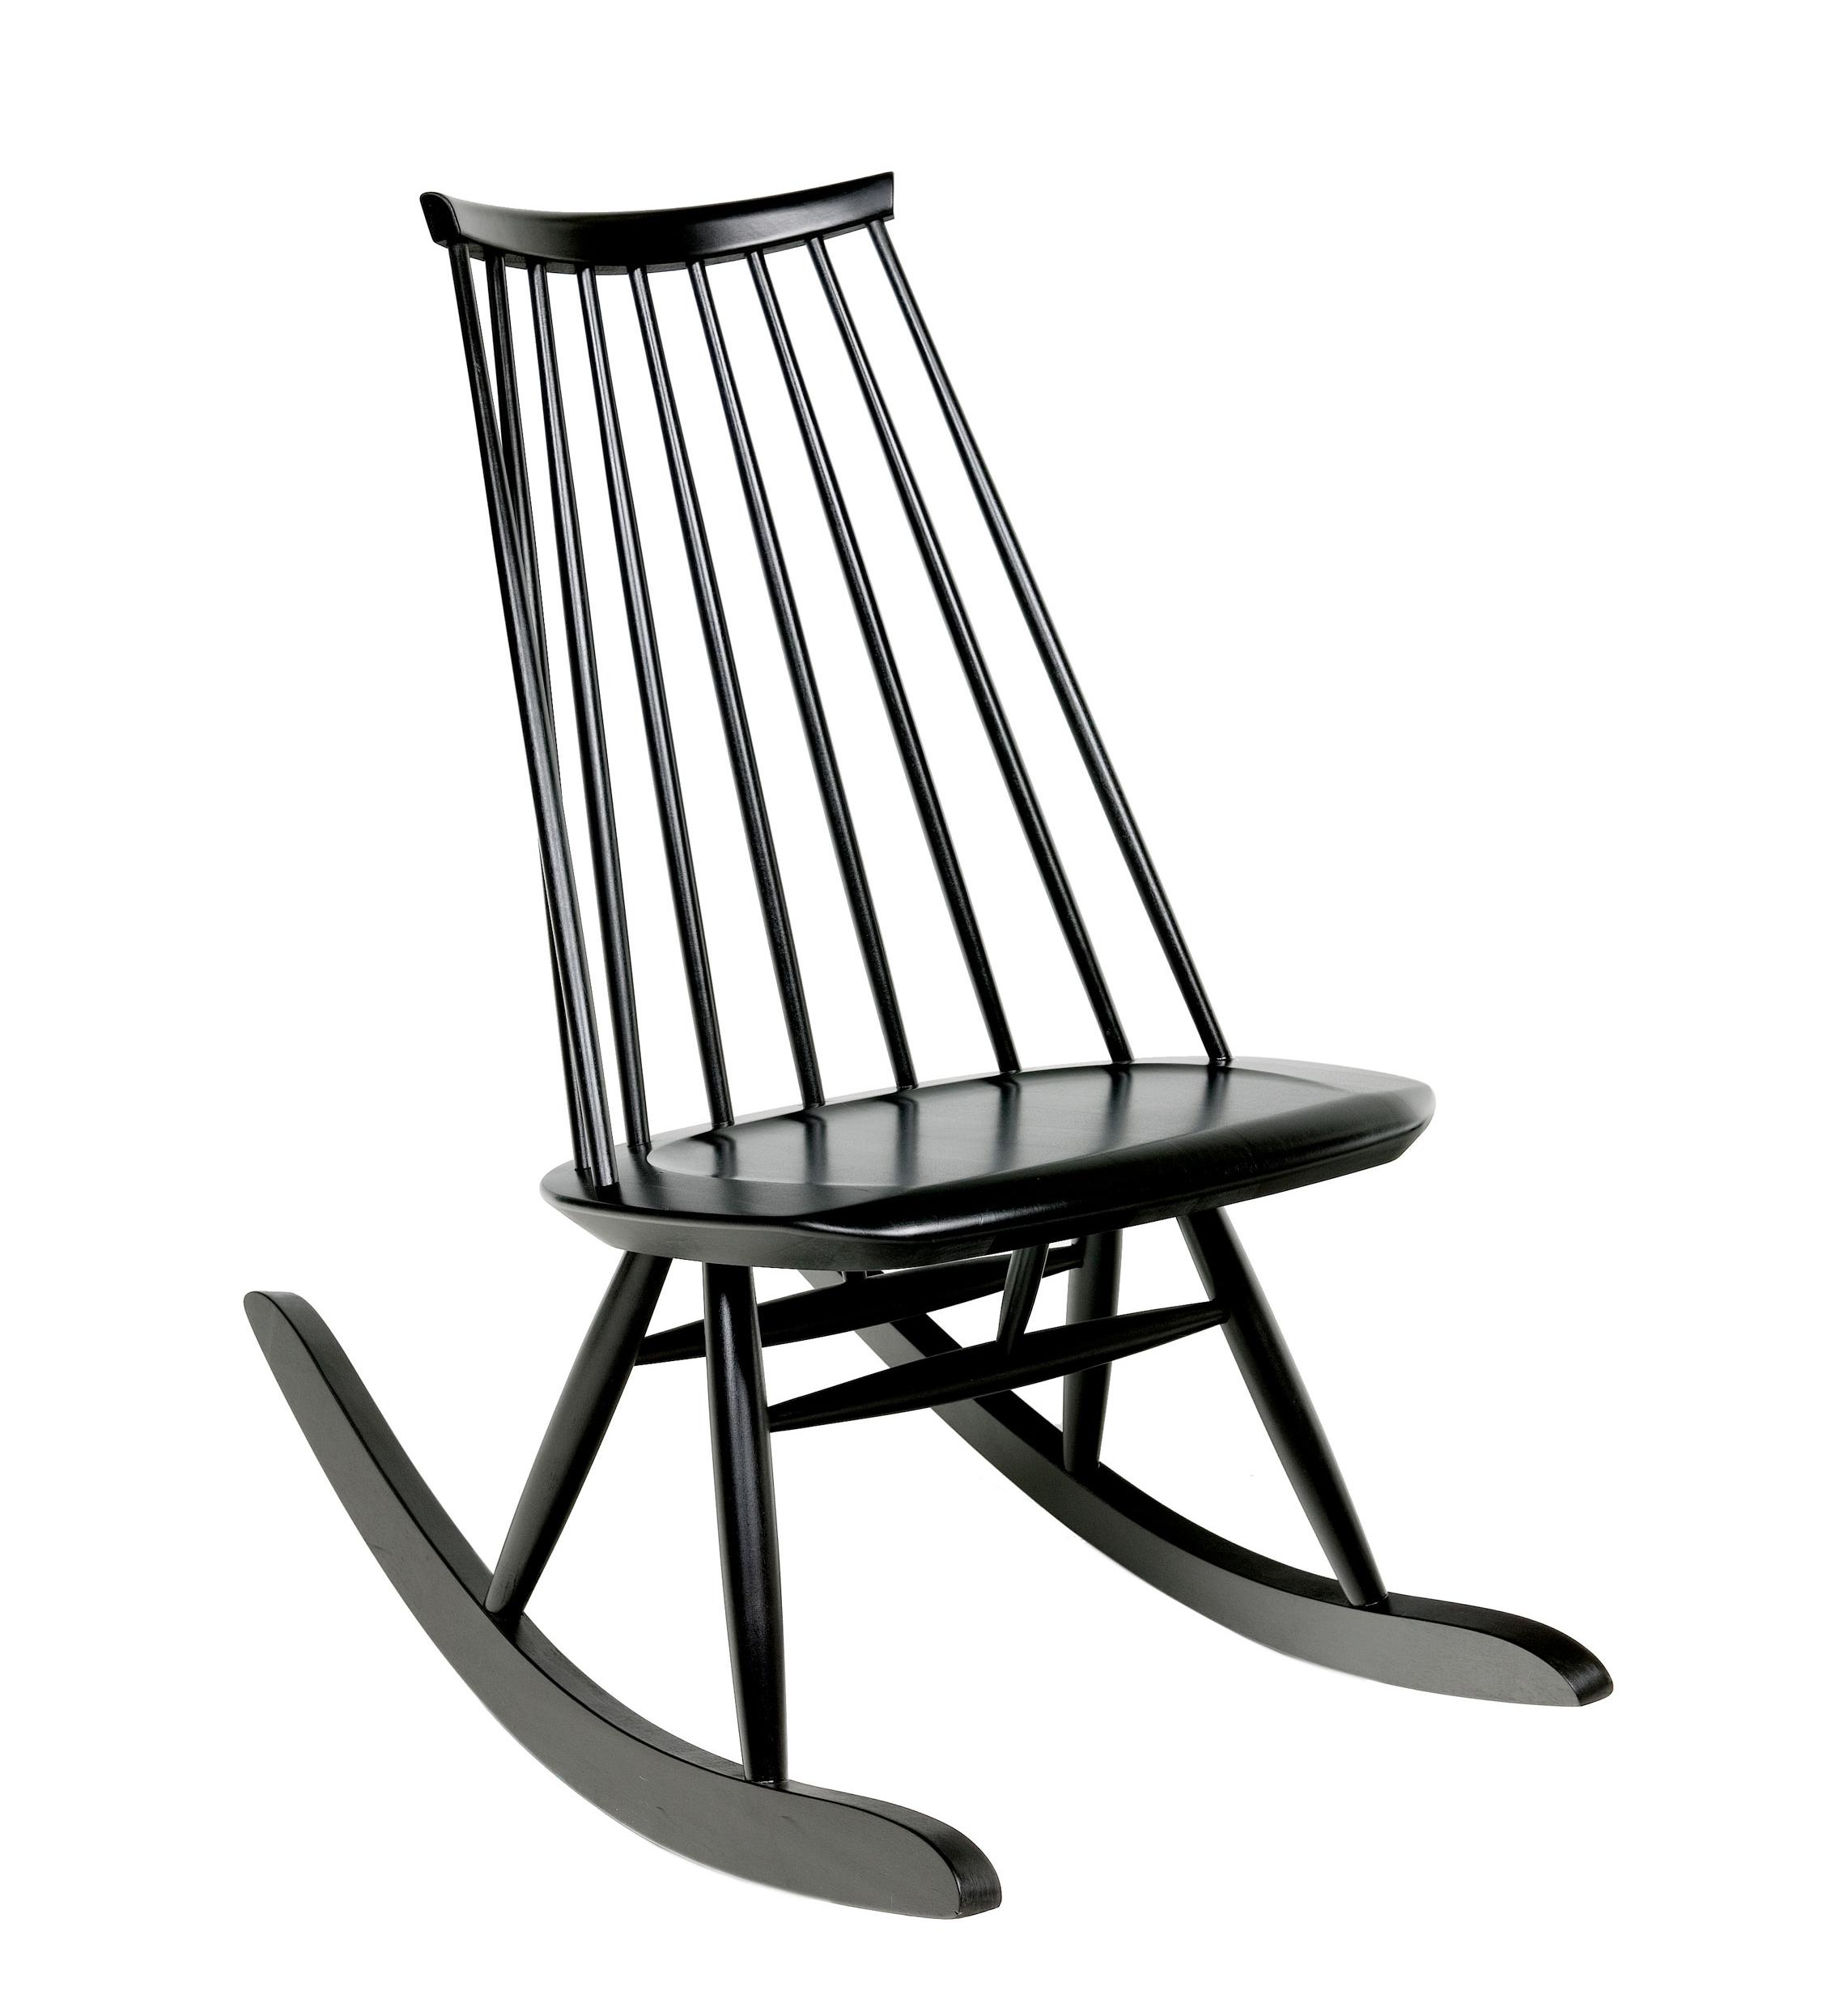 High Back Rocking Chair Plans Plans Free Download  testy39xqi